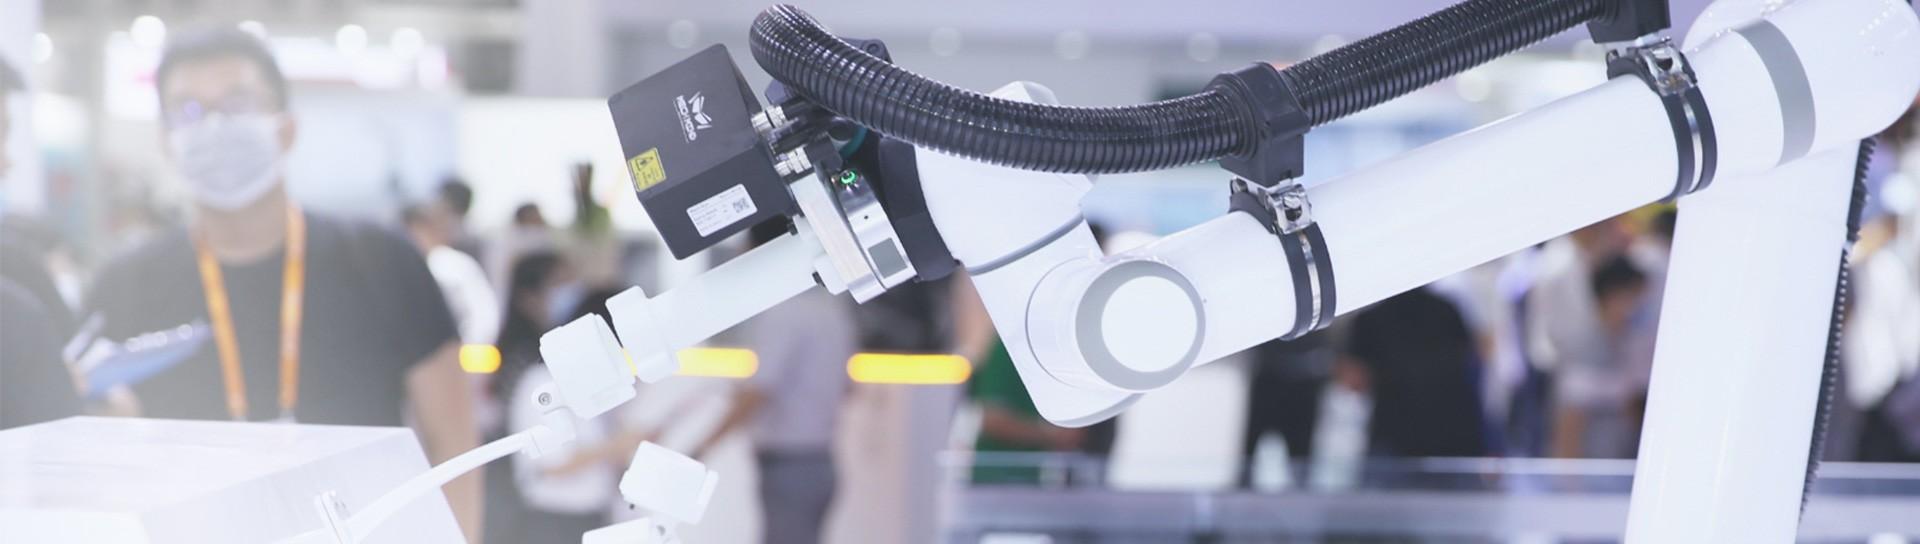 Mech-DL Kit 深度学习本地训练工具